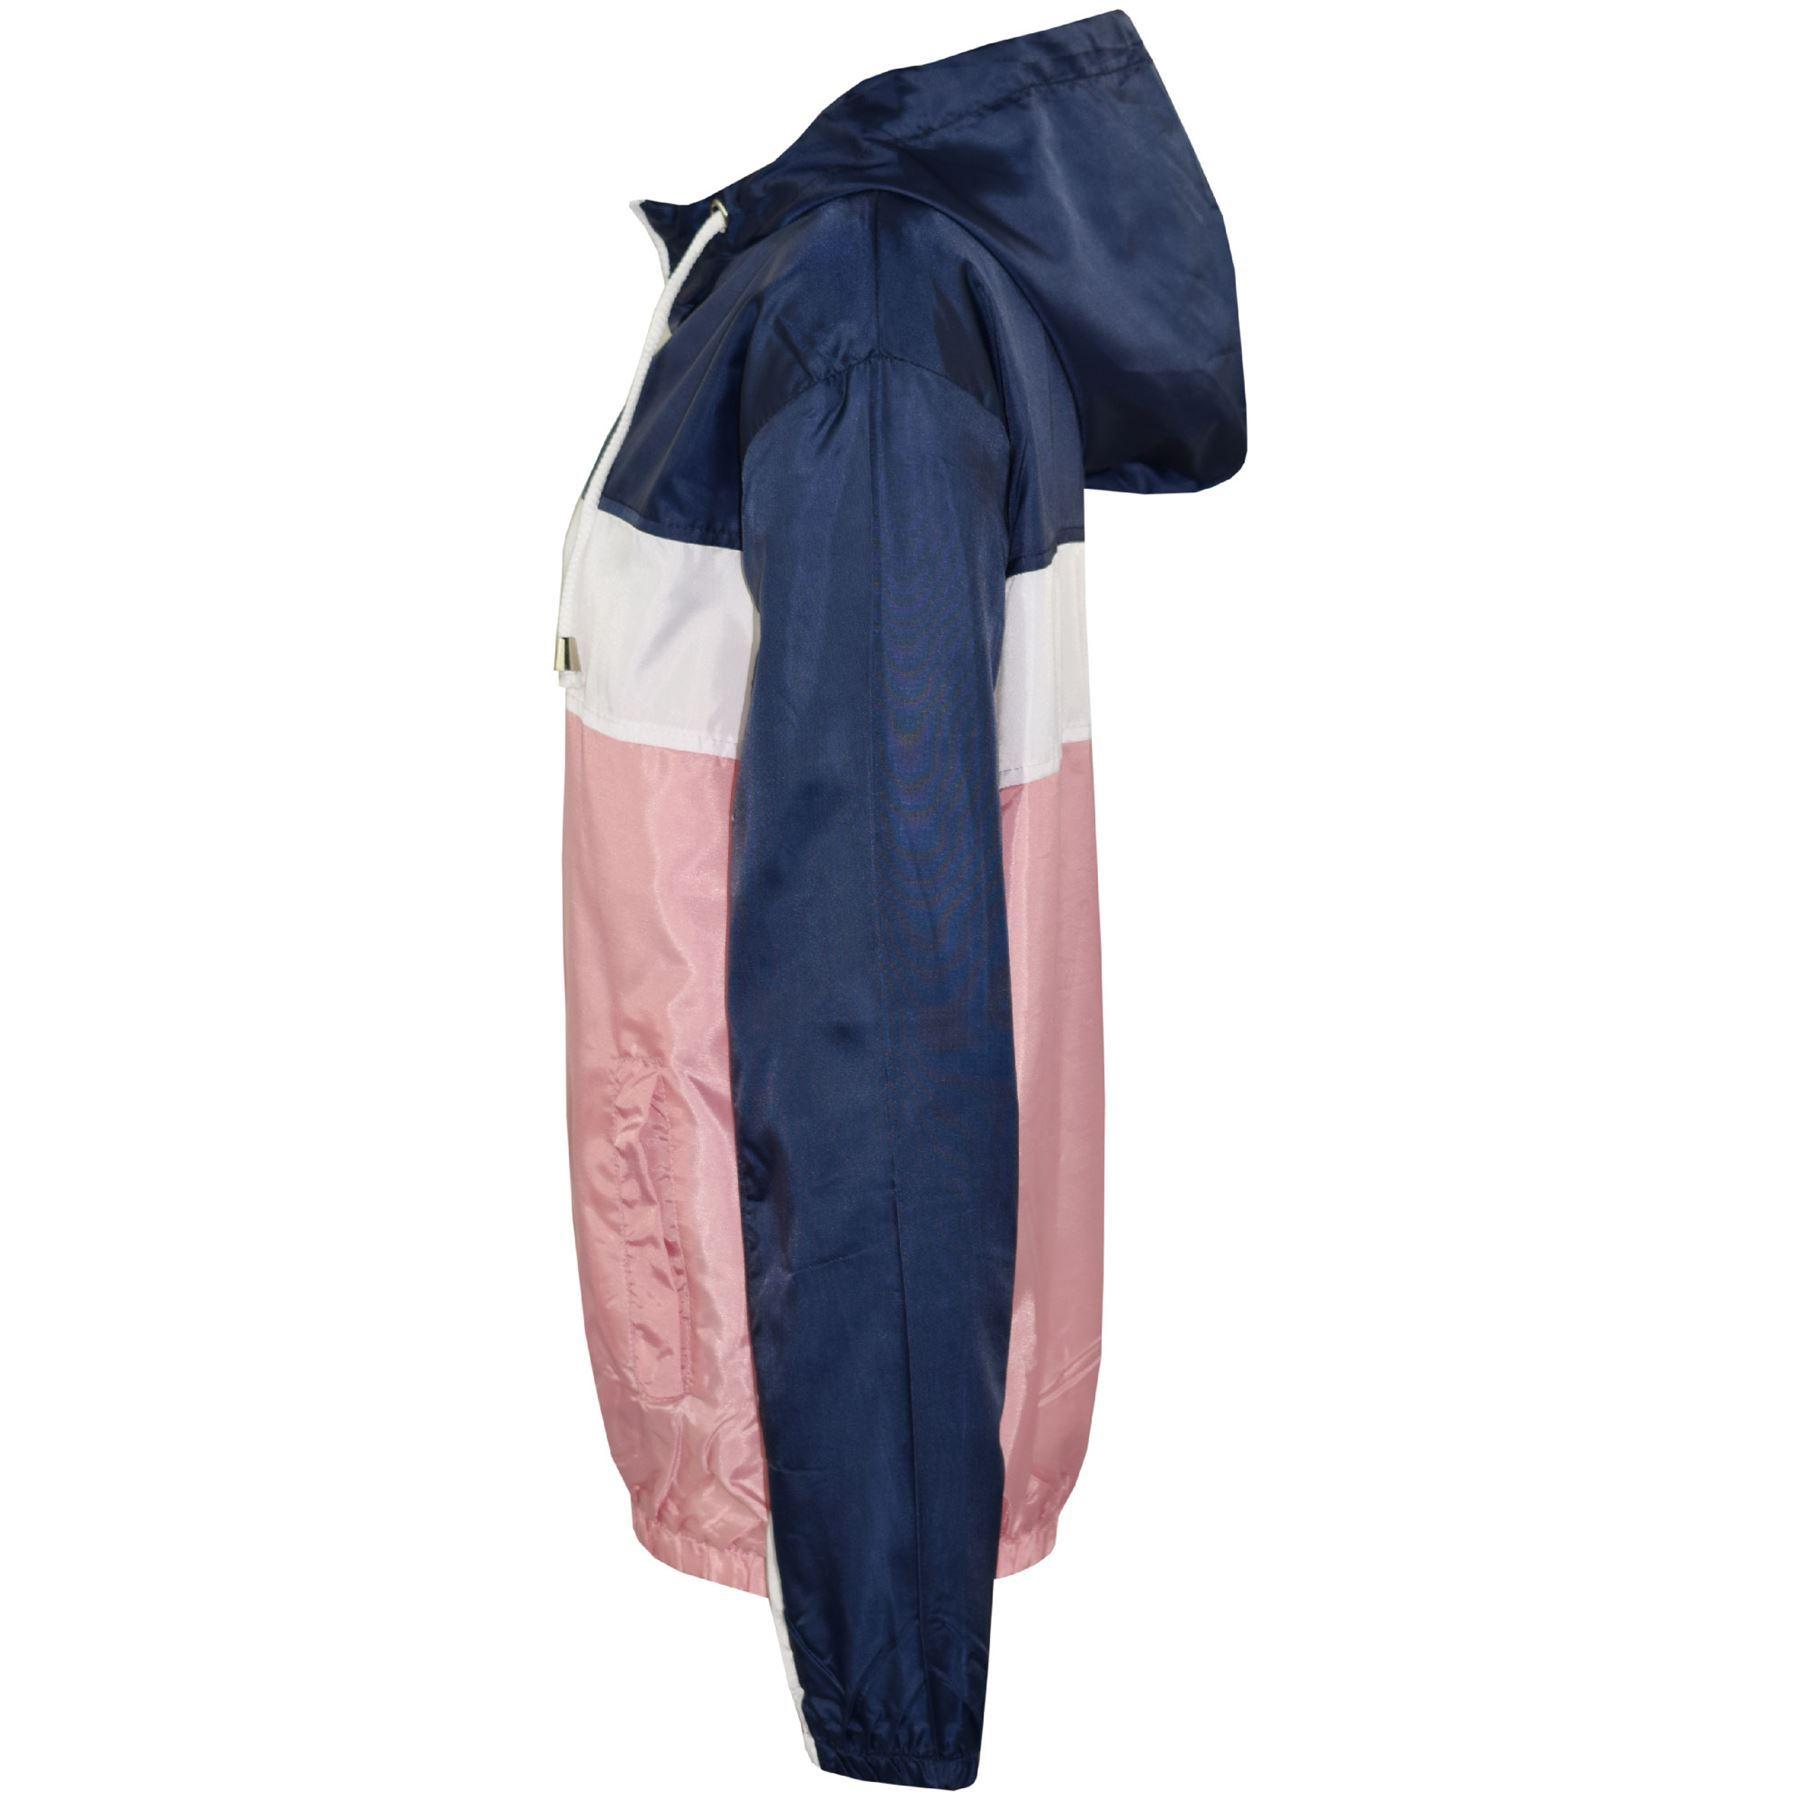 Kids-Boys-Girls-Windbreaker-Contrast-Block-Hooded-Jackets-Rain-Mac-Raincoat-5-13 thumbnail 13